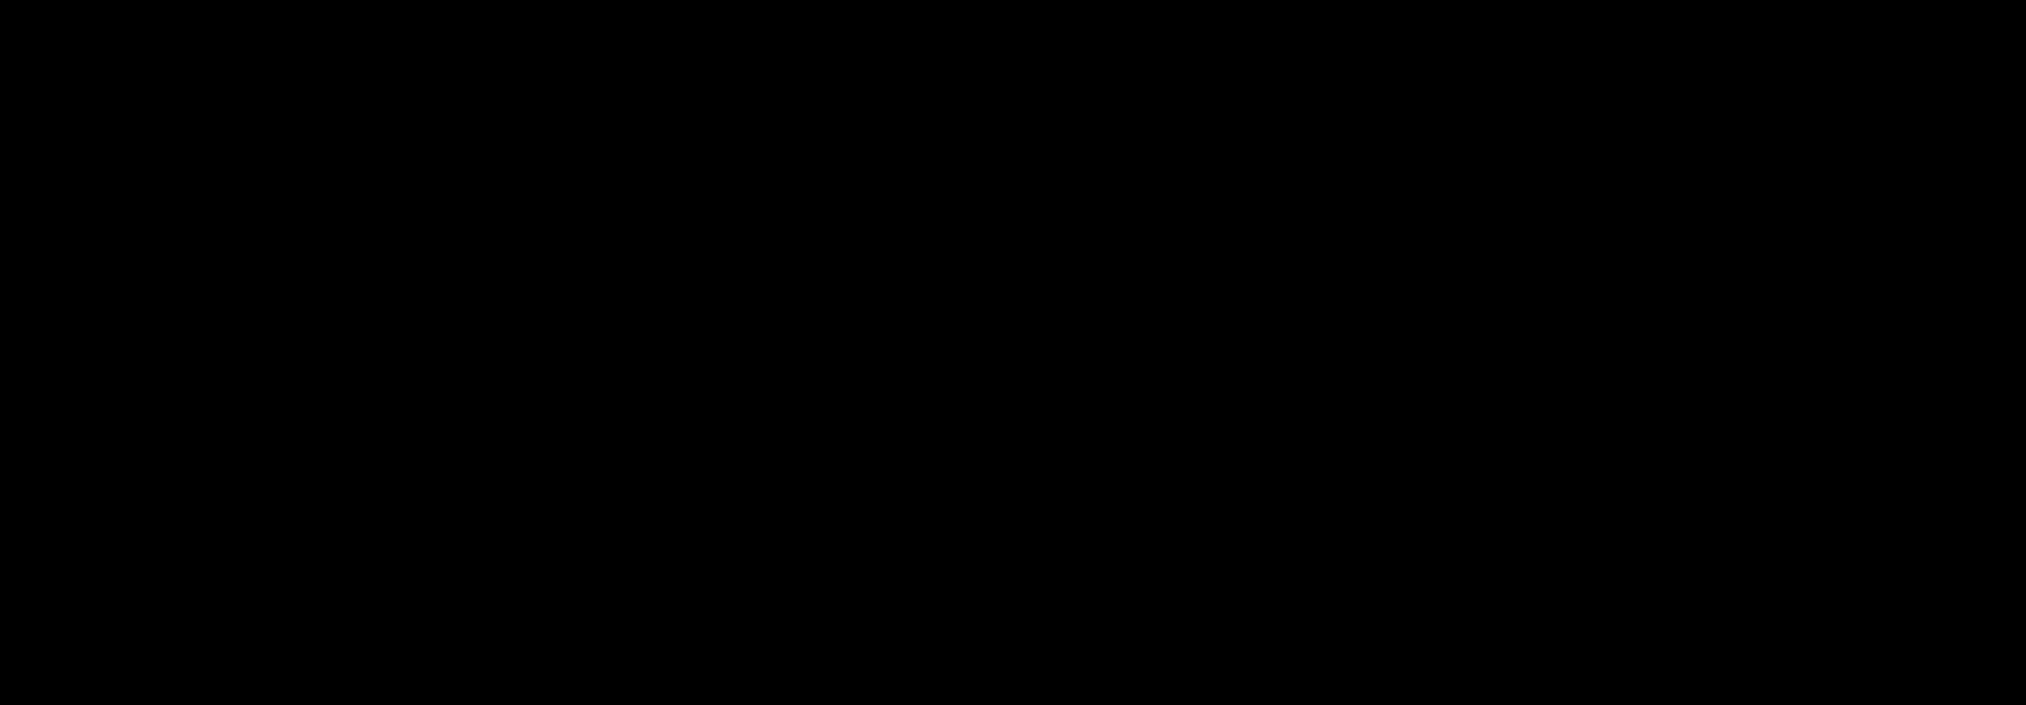 outline signature-lrg